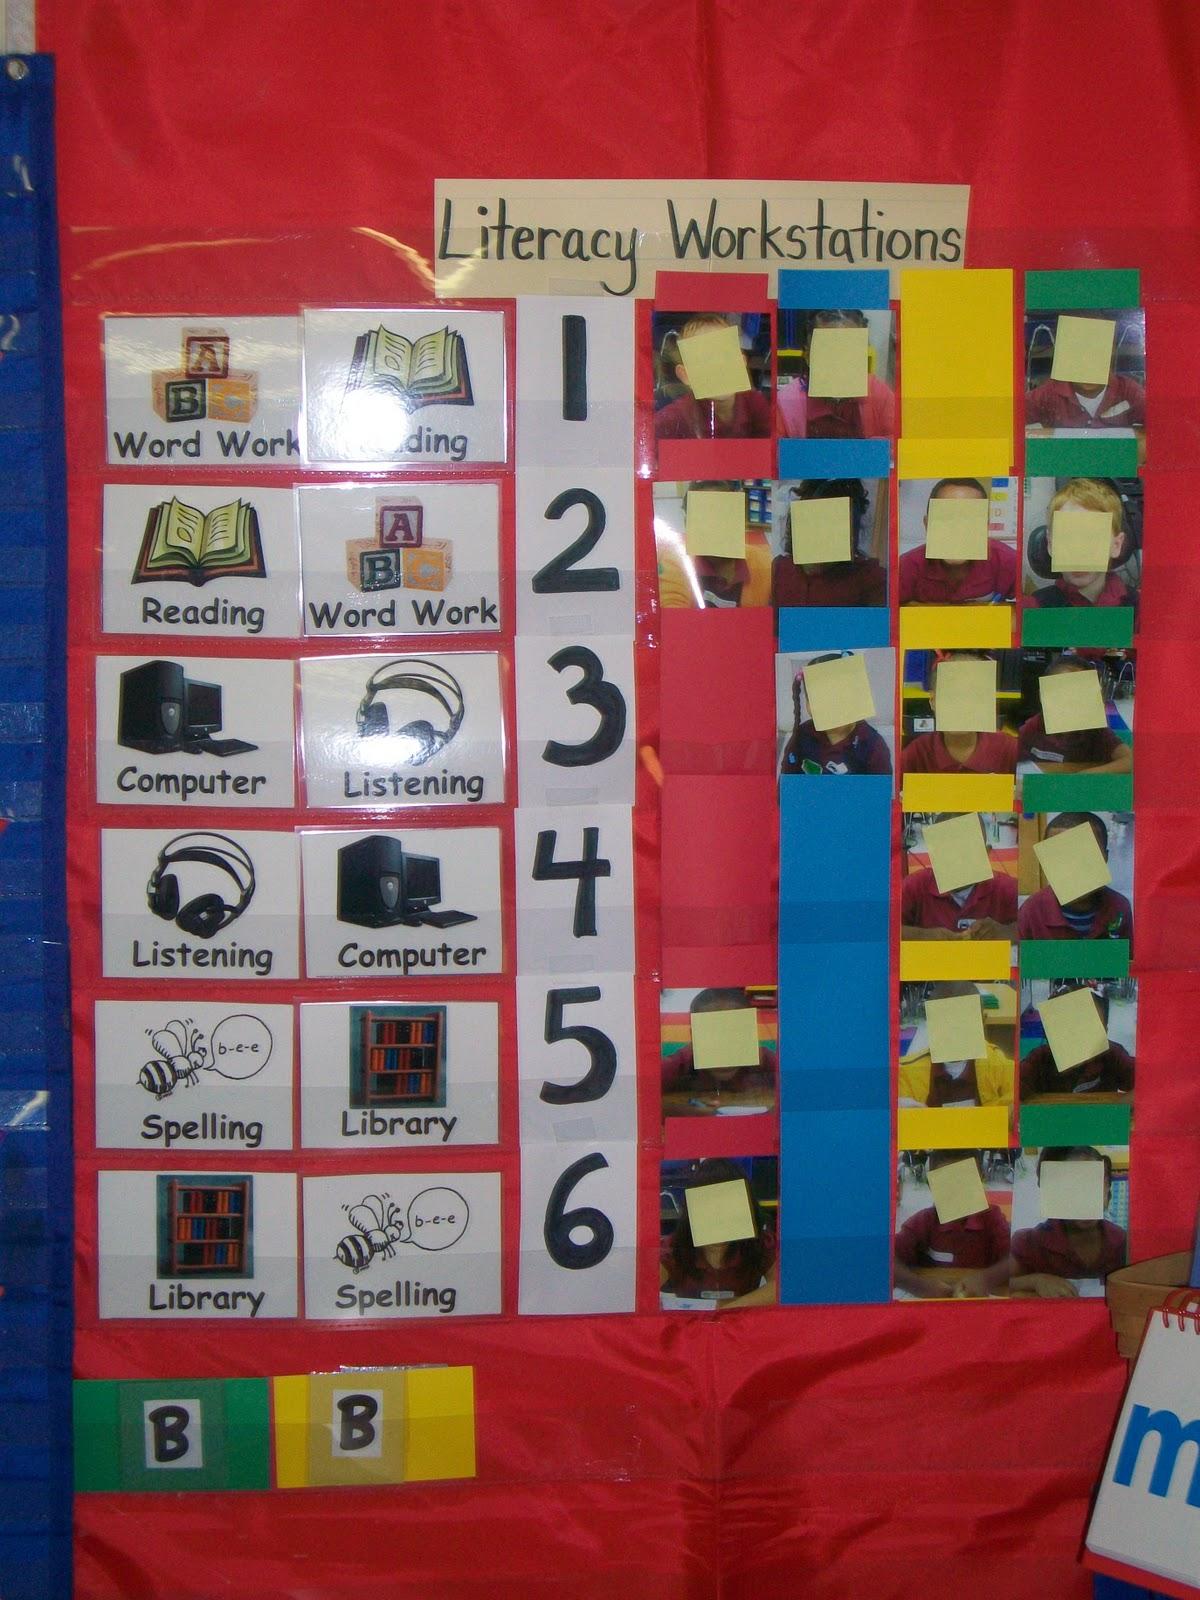 Classroom Workstation Ideas : First grade school box literacy workstation rotation chart